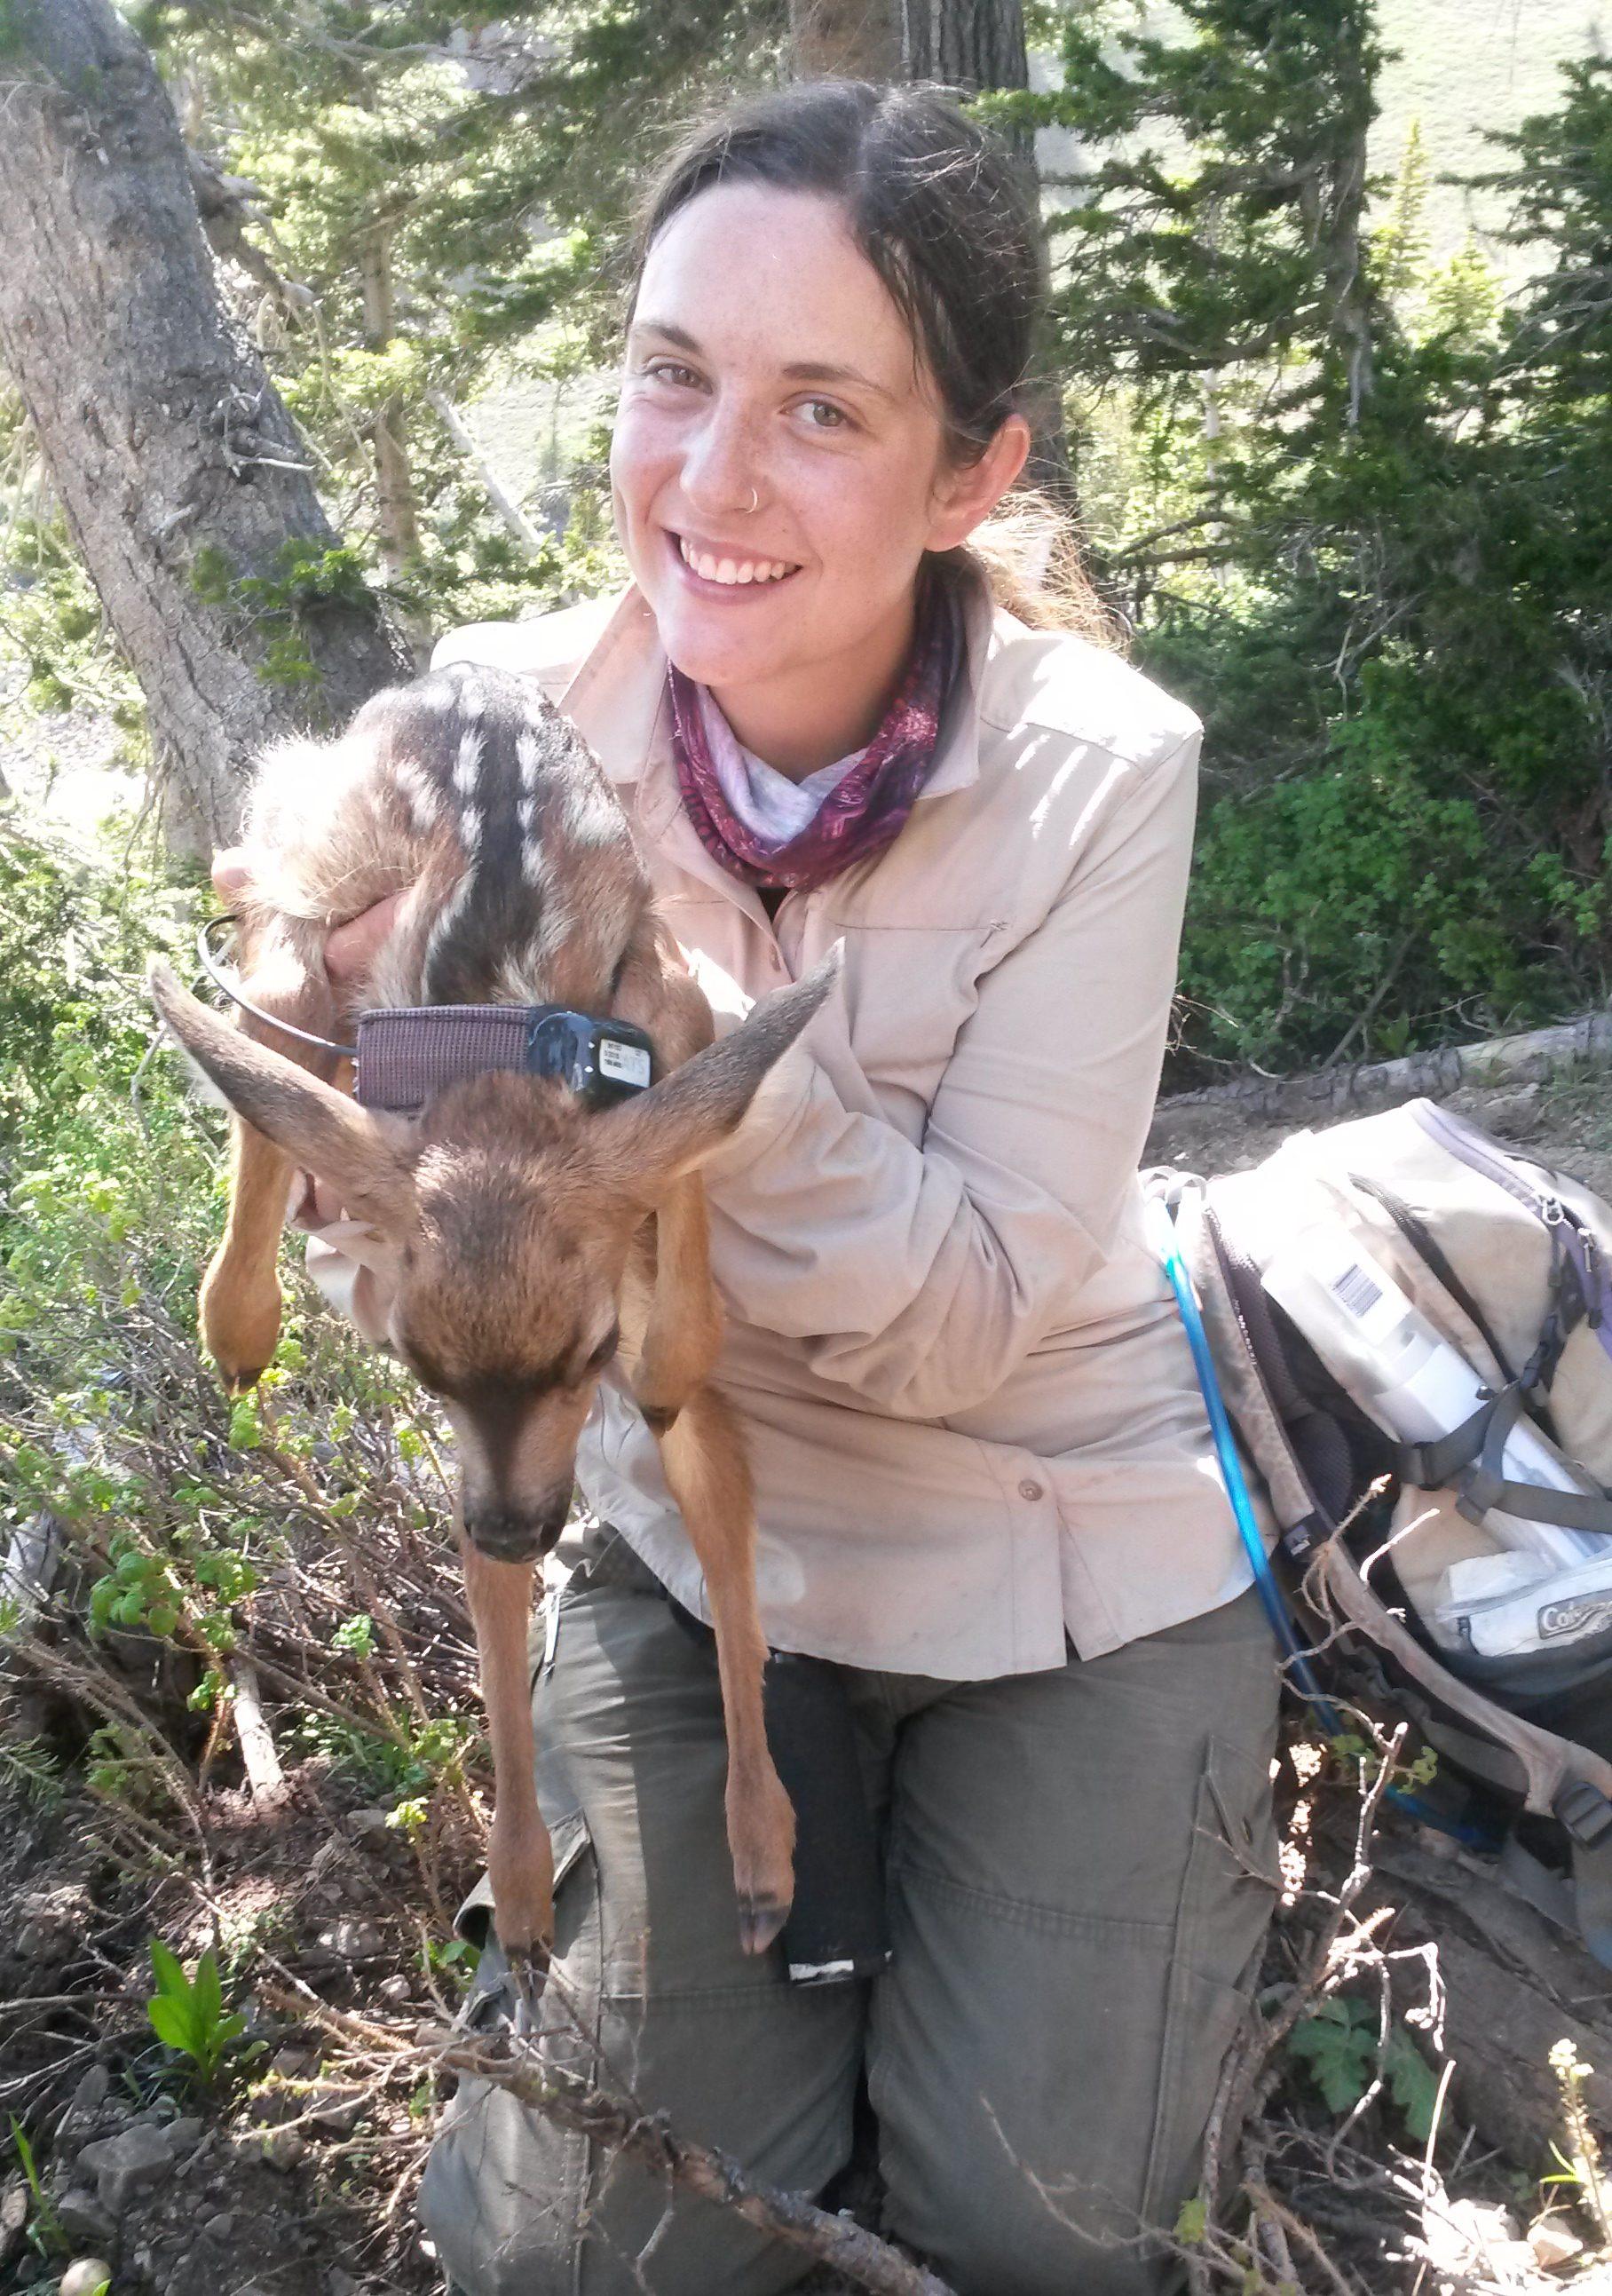 Jakopak holding a recently collared mule deer fawn.